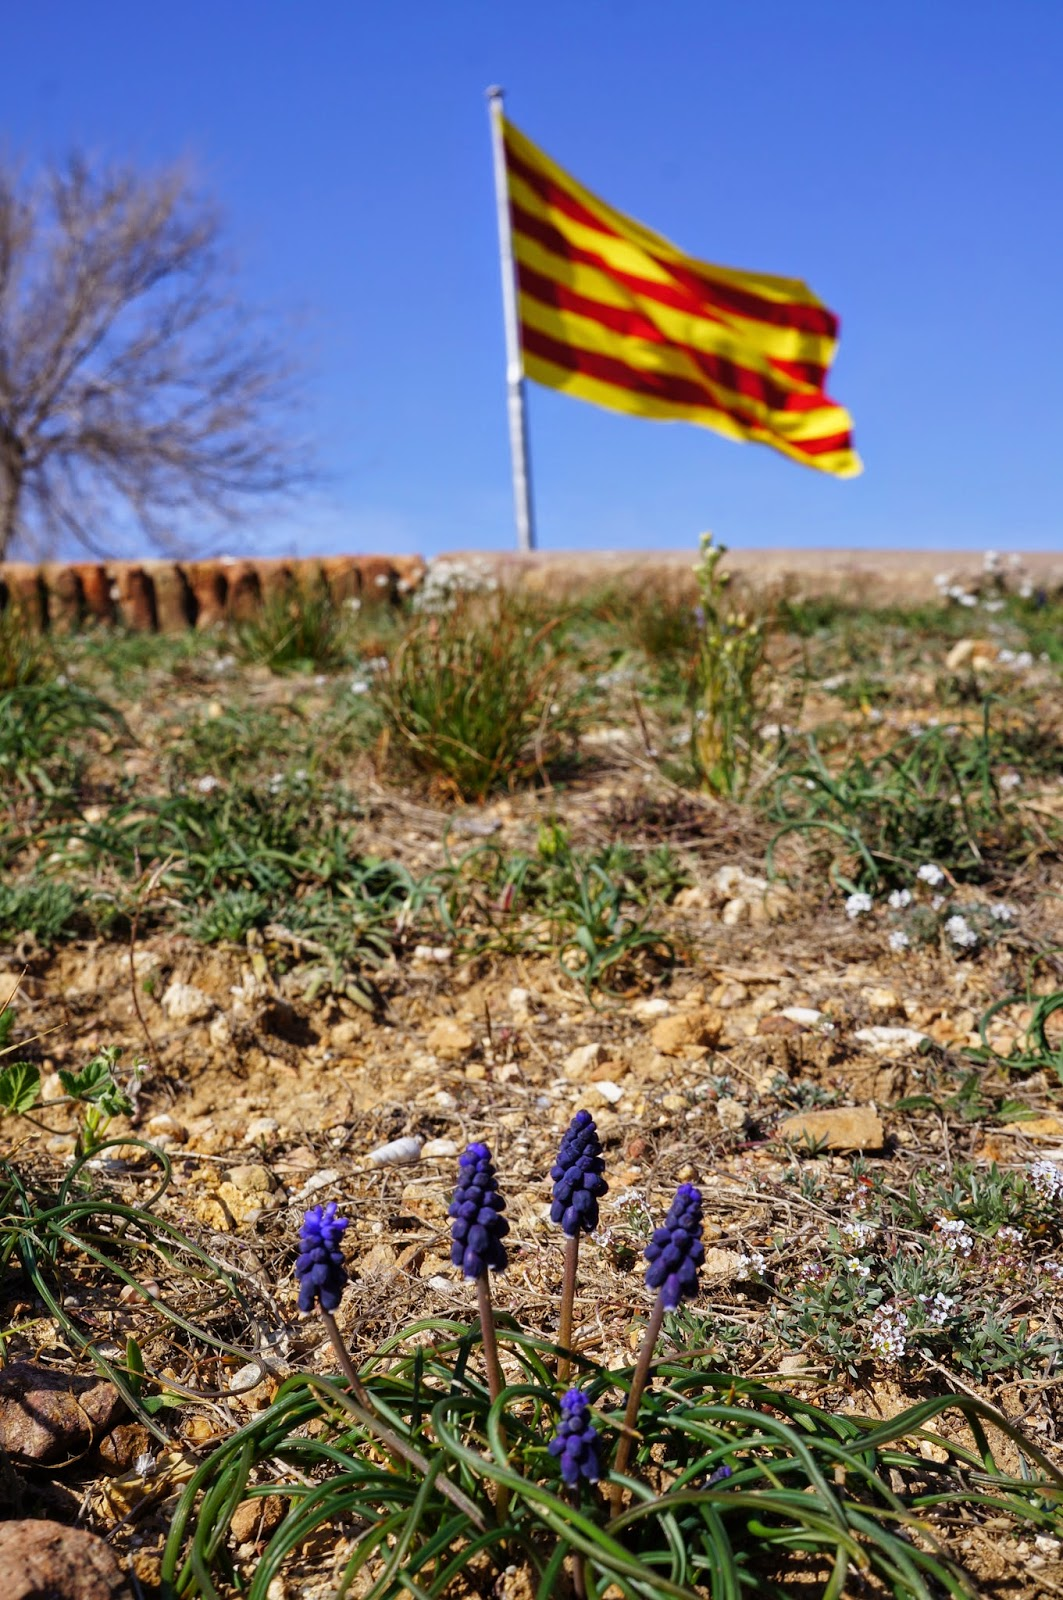 La Senyera Catalonian / Catalan flag at the Montjuic Castle, Barcelona Spain.